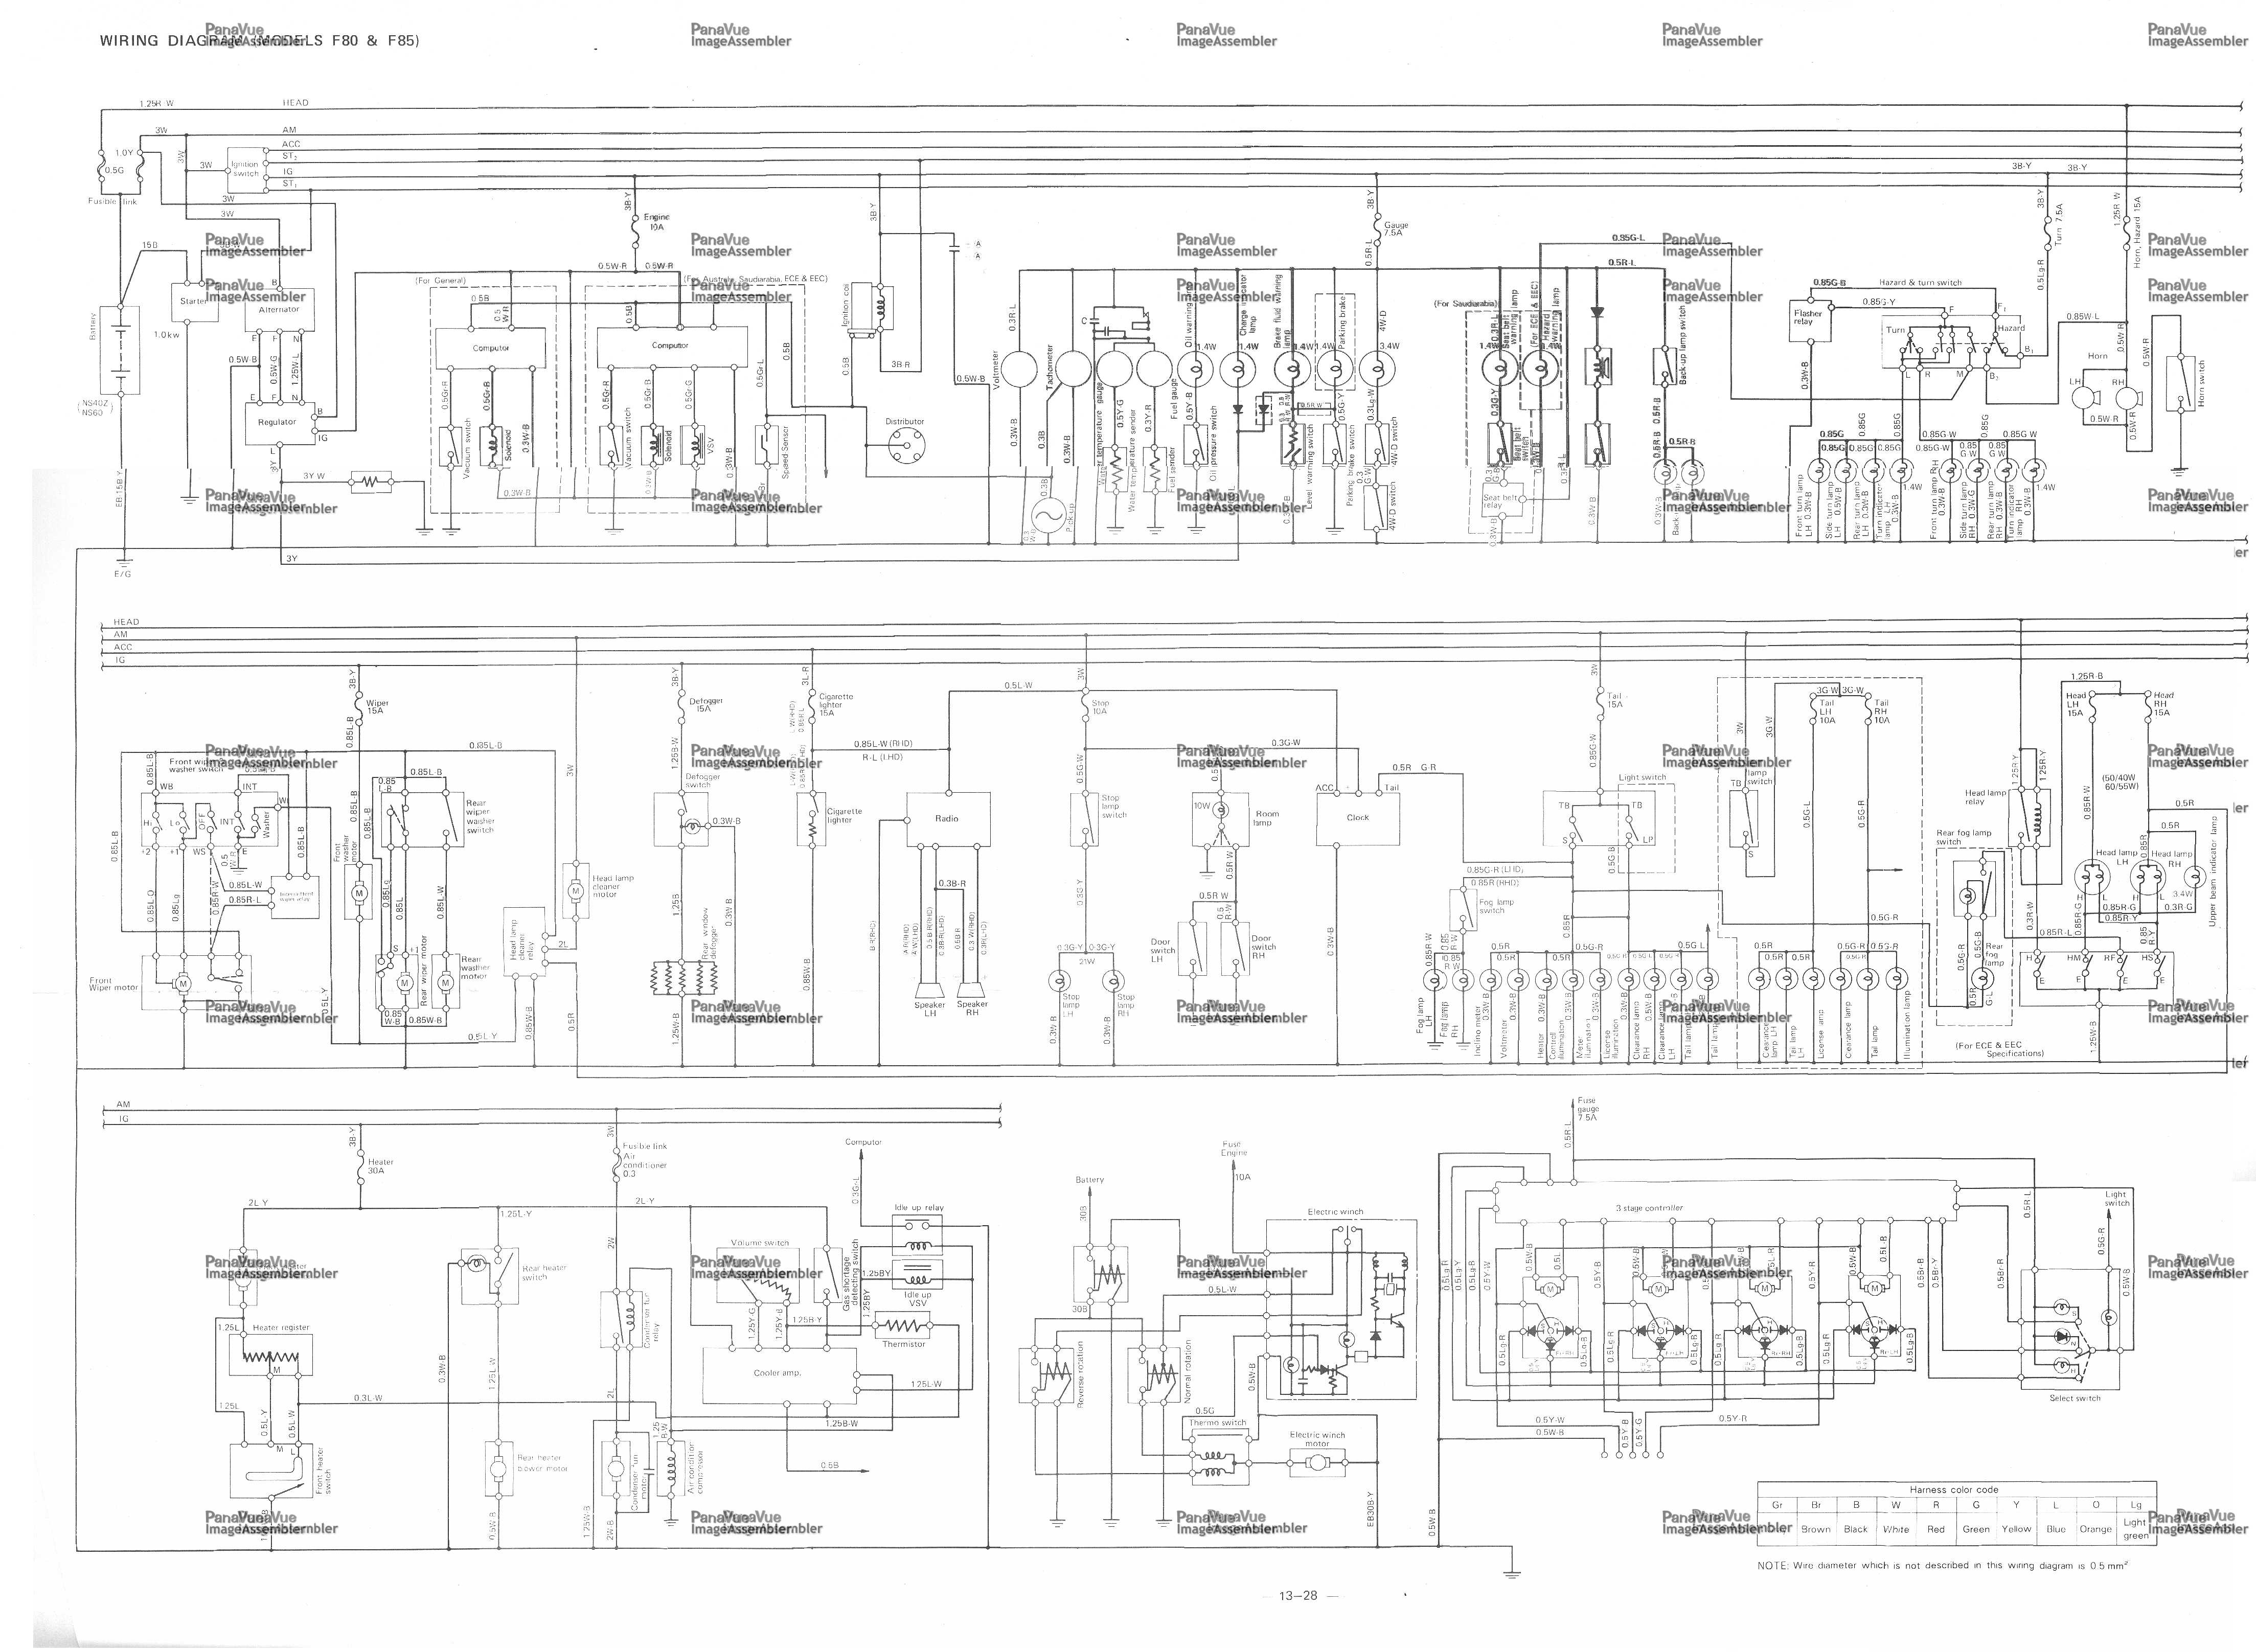 1998 suzuki swift fuse box explained wiring diagrams rh sbsun co